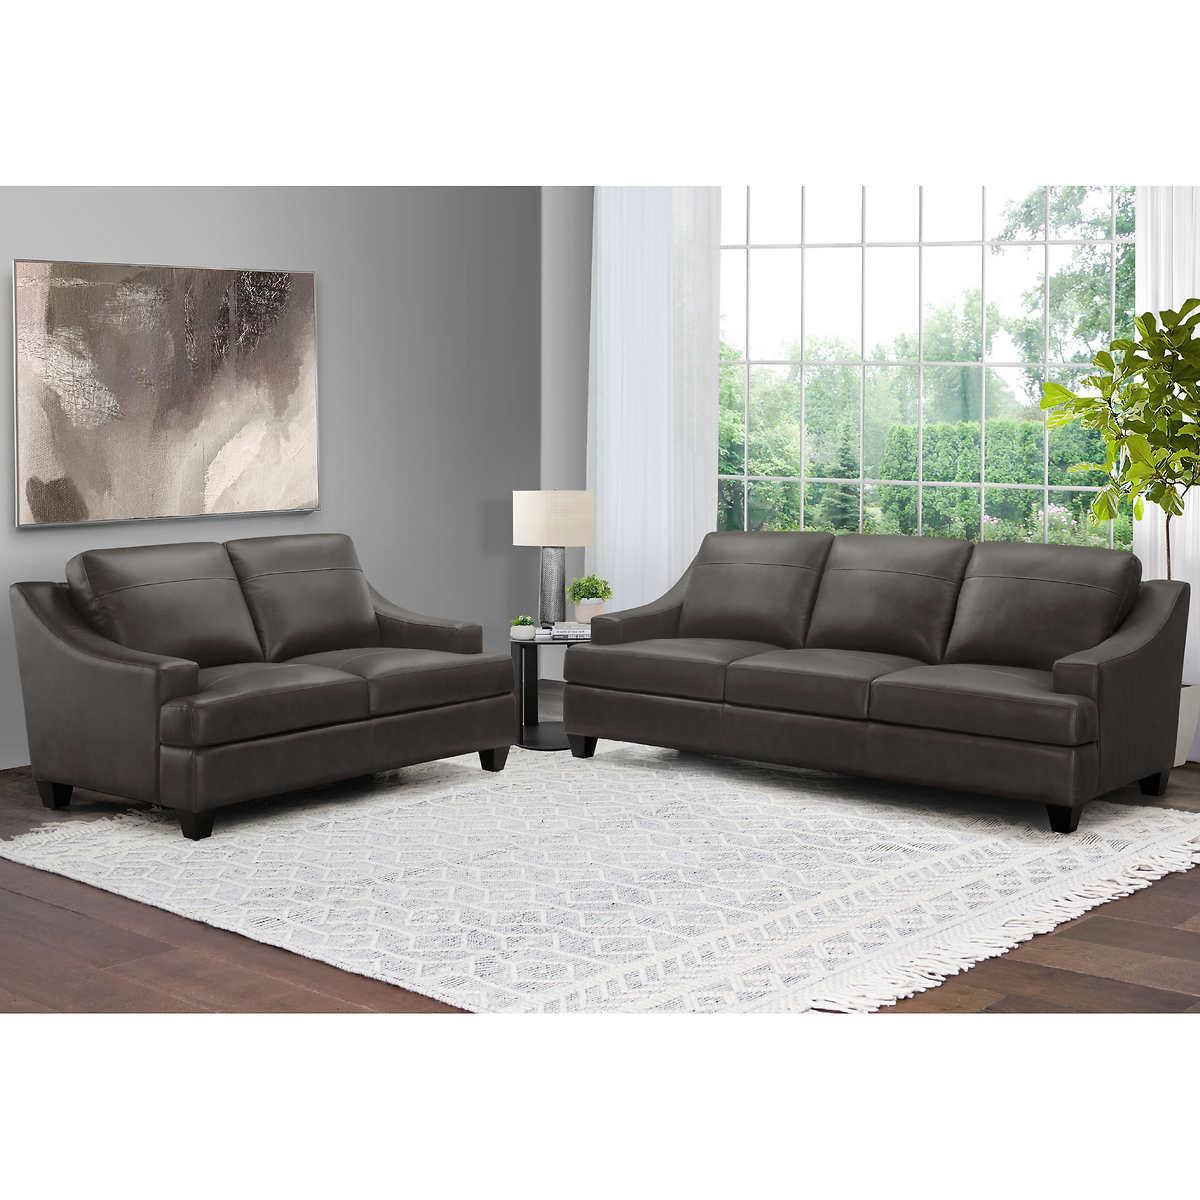 Merona 2 Piece Leather Sofa And Loveseat Set